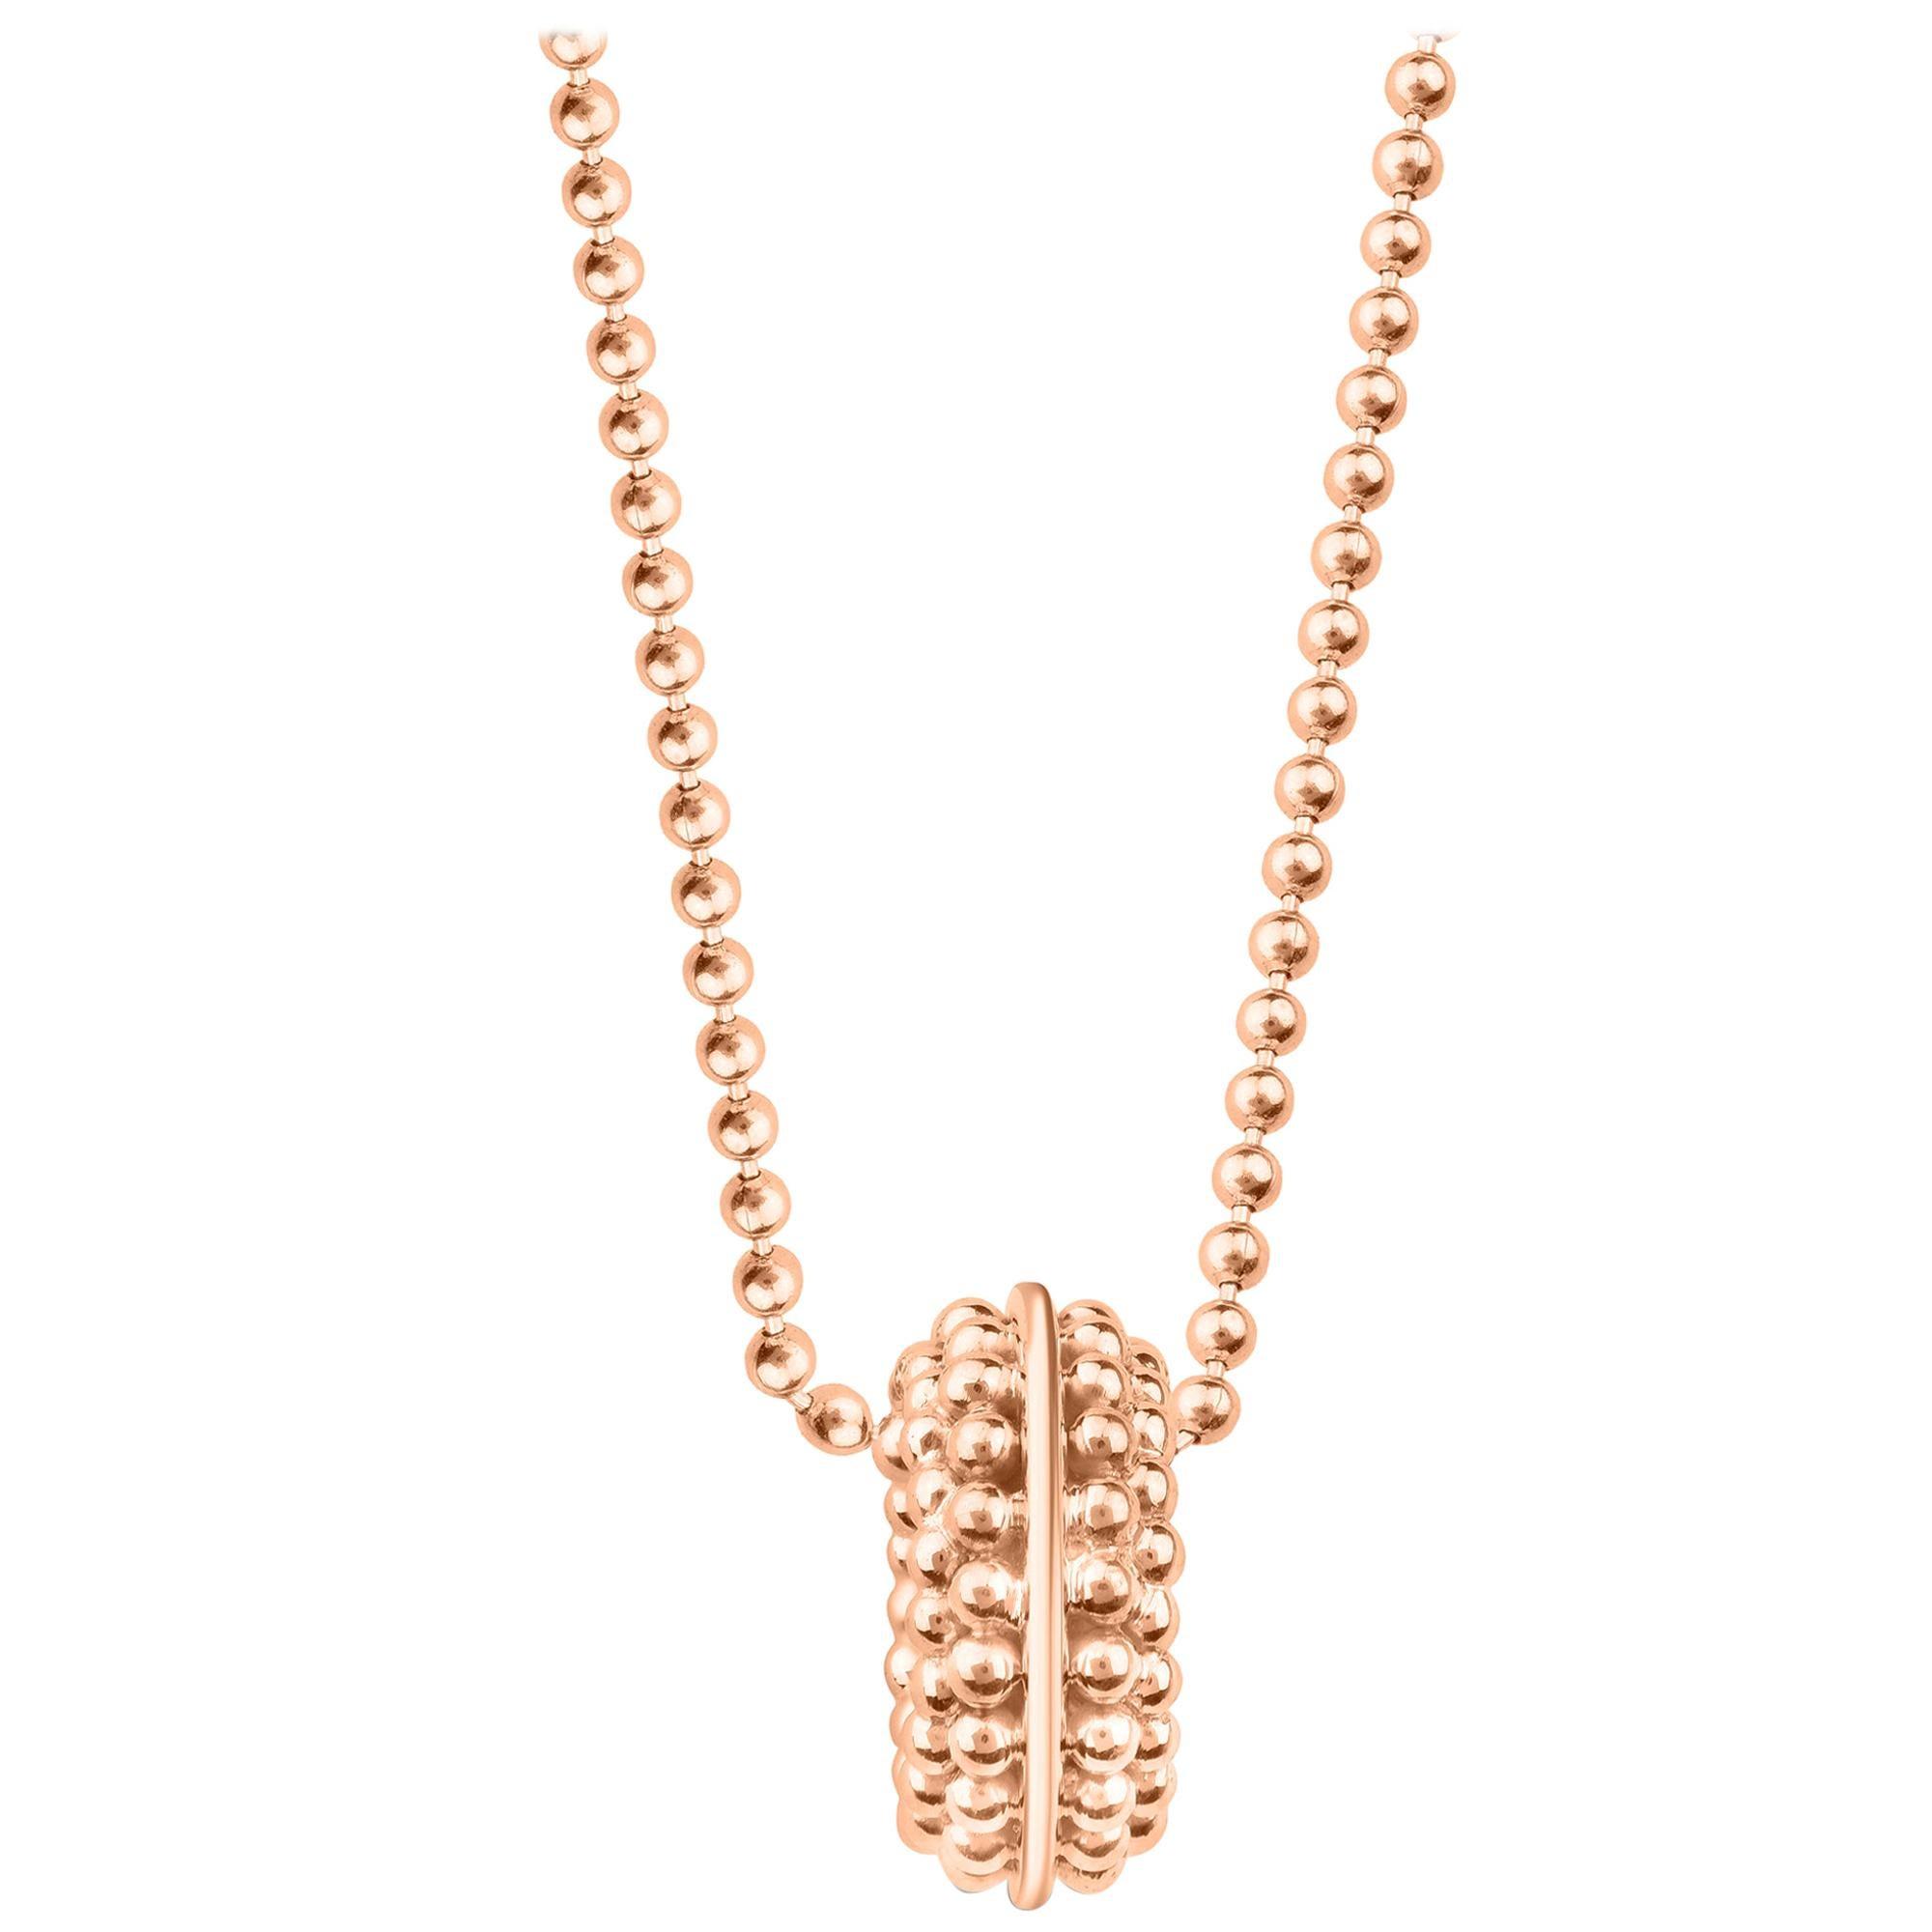 Harakh 18 Karat Rose Gold Sunlight Pendant Necklace